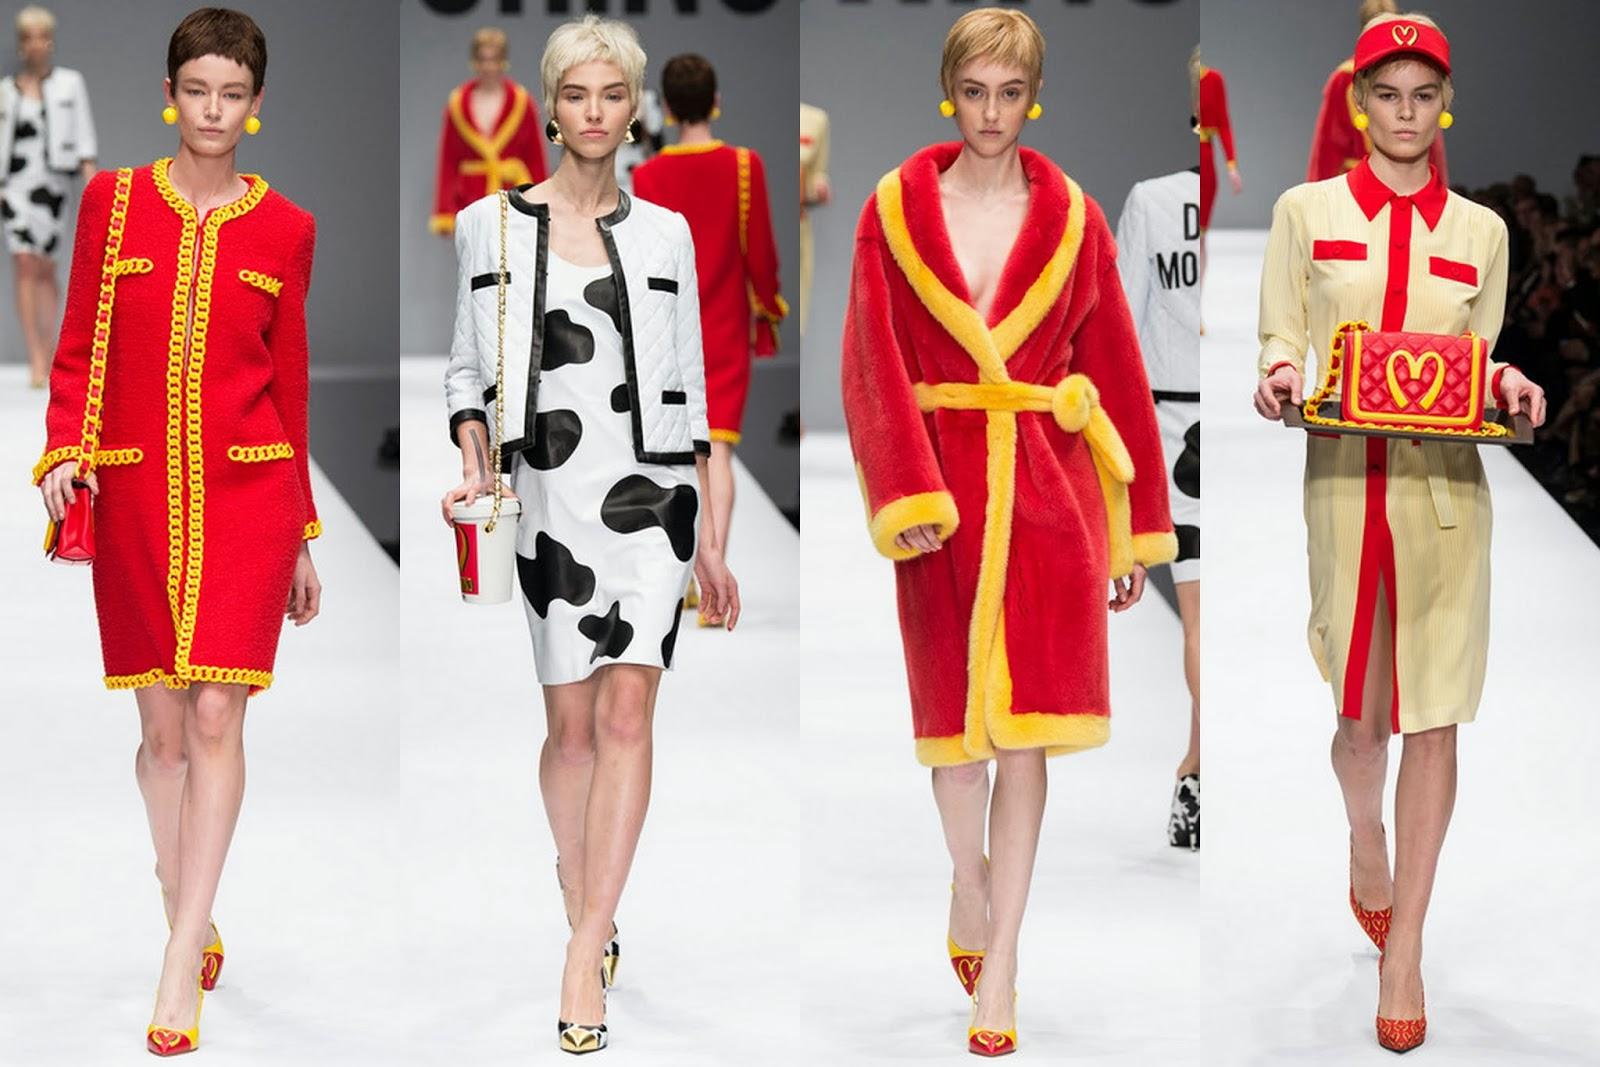 Moschino megmutatja milyen is az igazi fast-fashion - trendek-2, oszi-es-teli-divat, minden-mas, ujdonsagok -